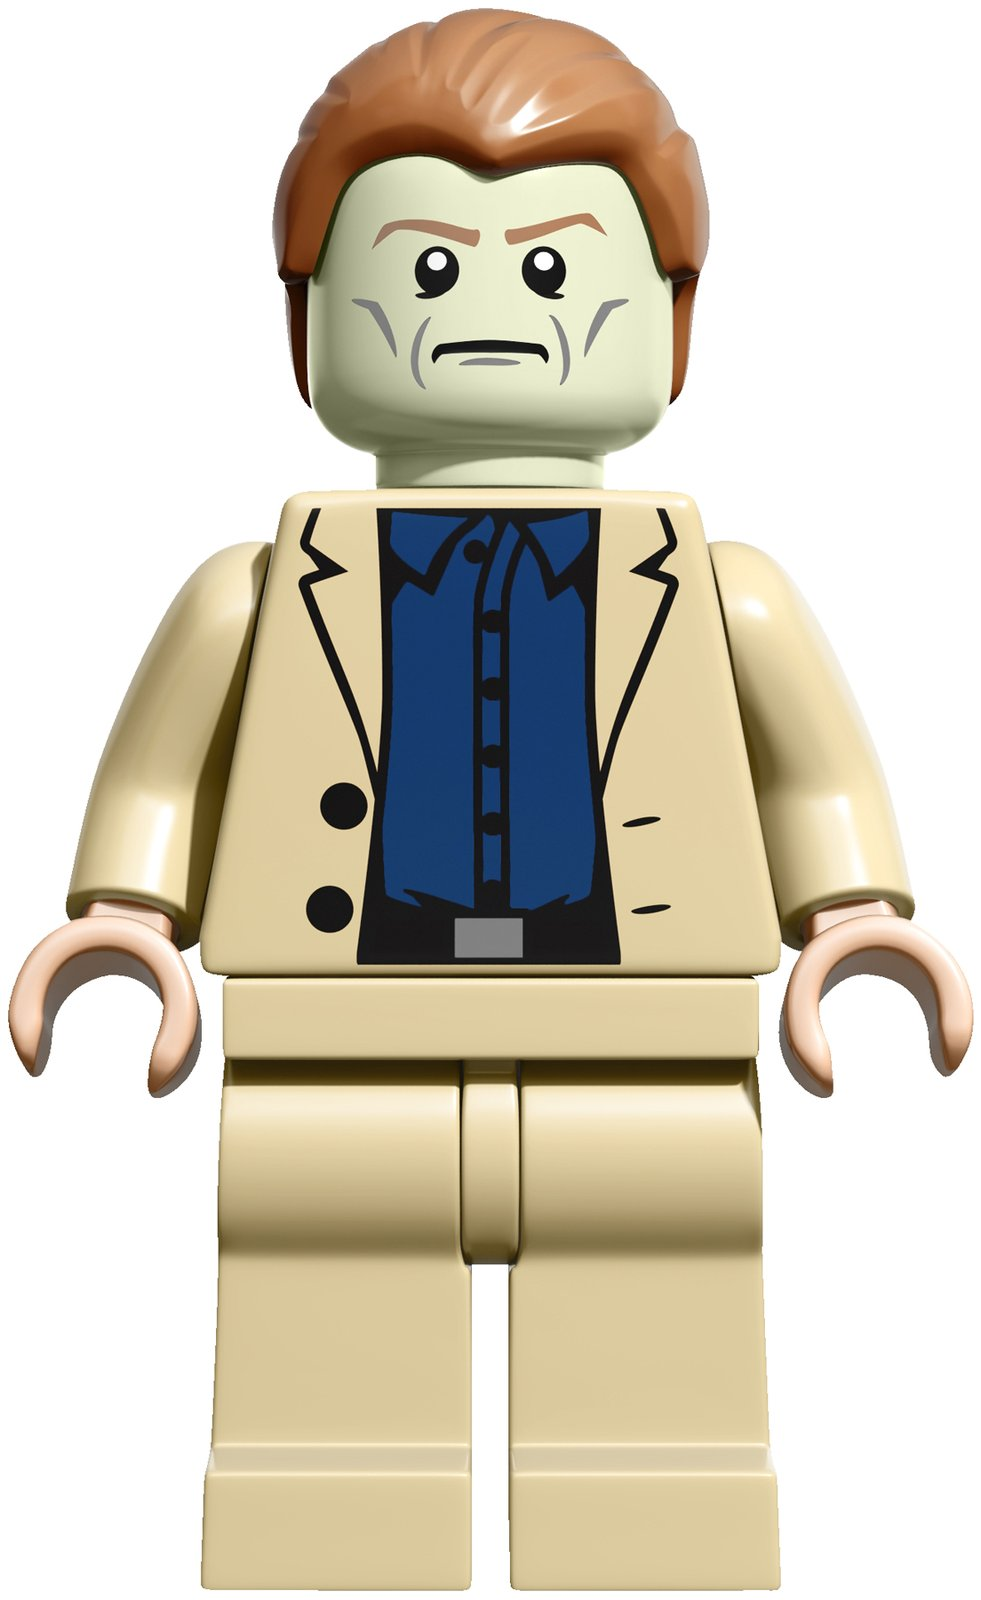 Lego marvel superheroes aldrich killian